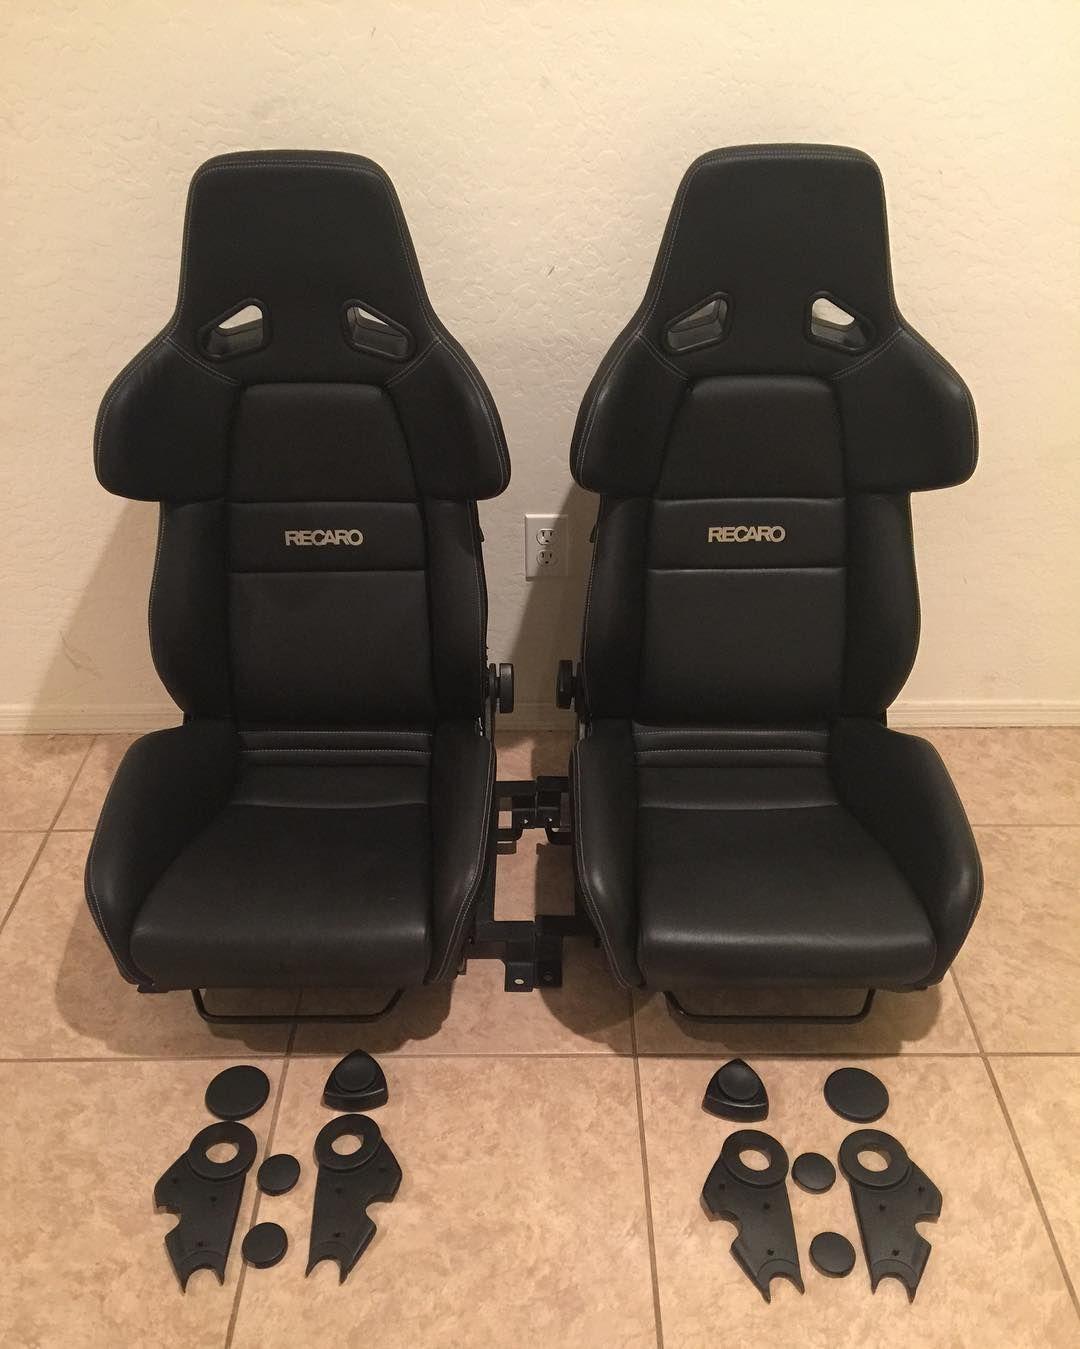 Mike Myers On Instagram For Sale Recaro A8 S Just Seats No Sliders Or Mounts Included Brand New Factory Recaro Recaro Porsche Motorsport Porsche Design